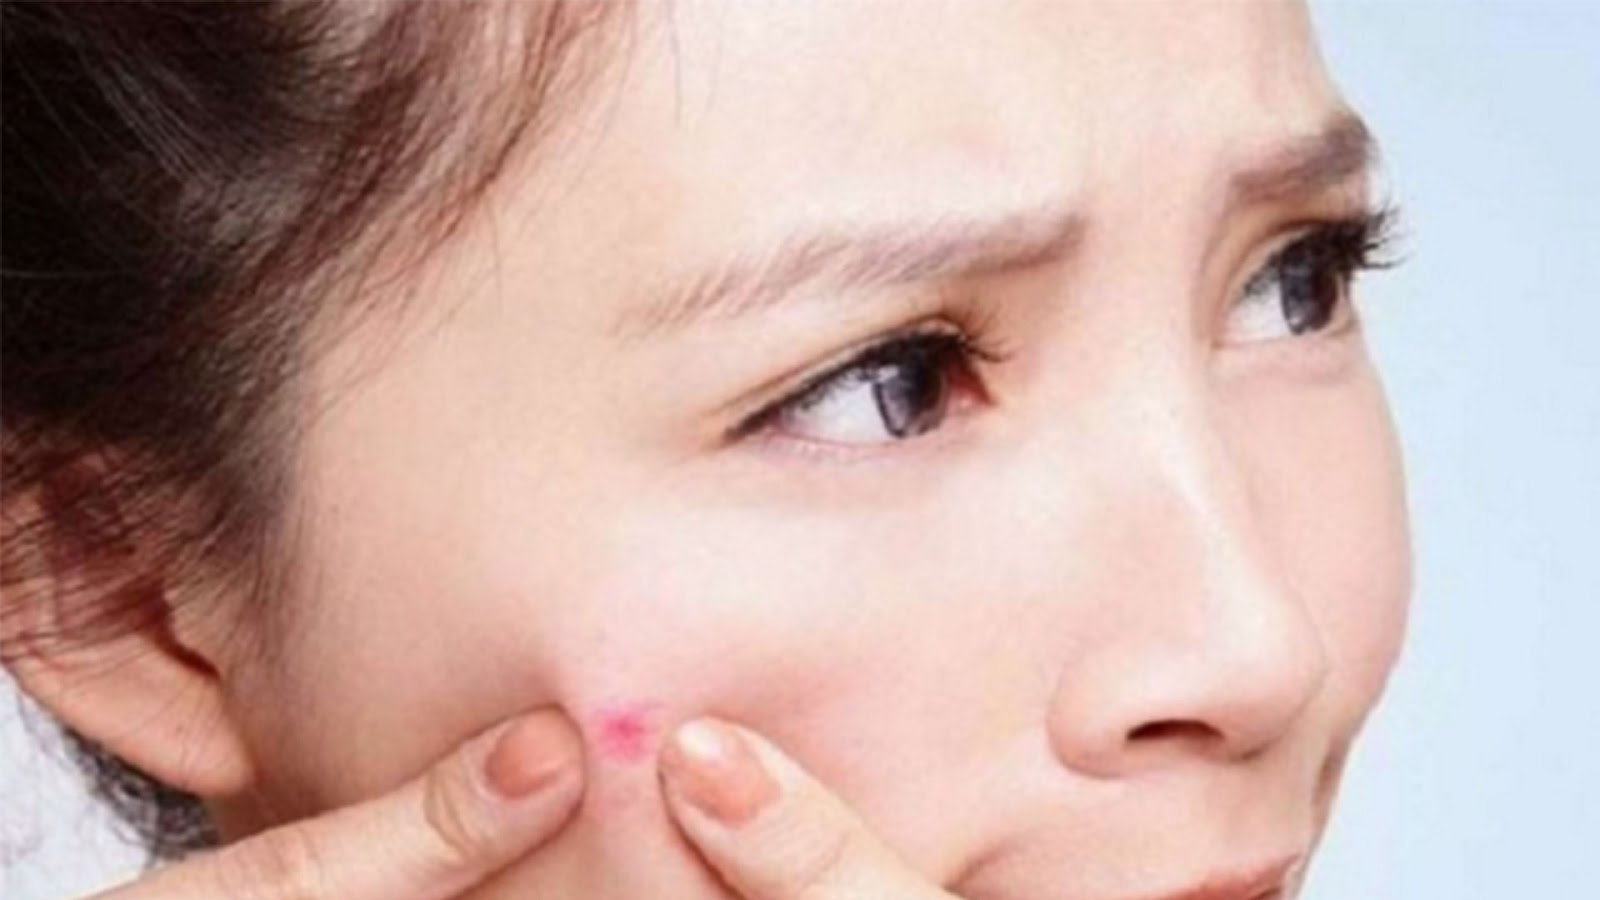 cystic acne, acne, acne treatment, acne skin care